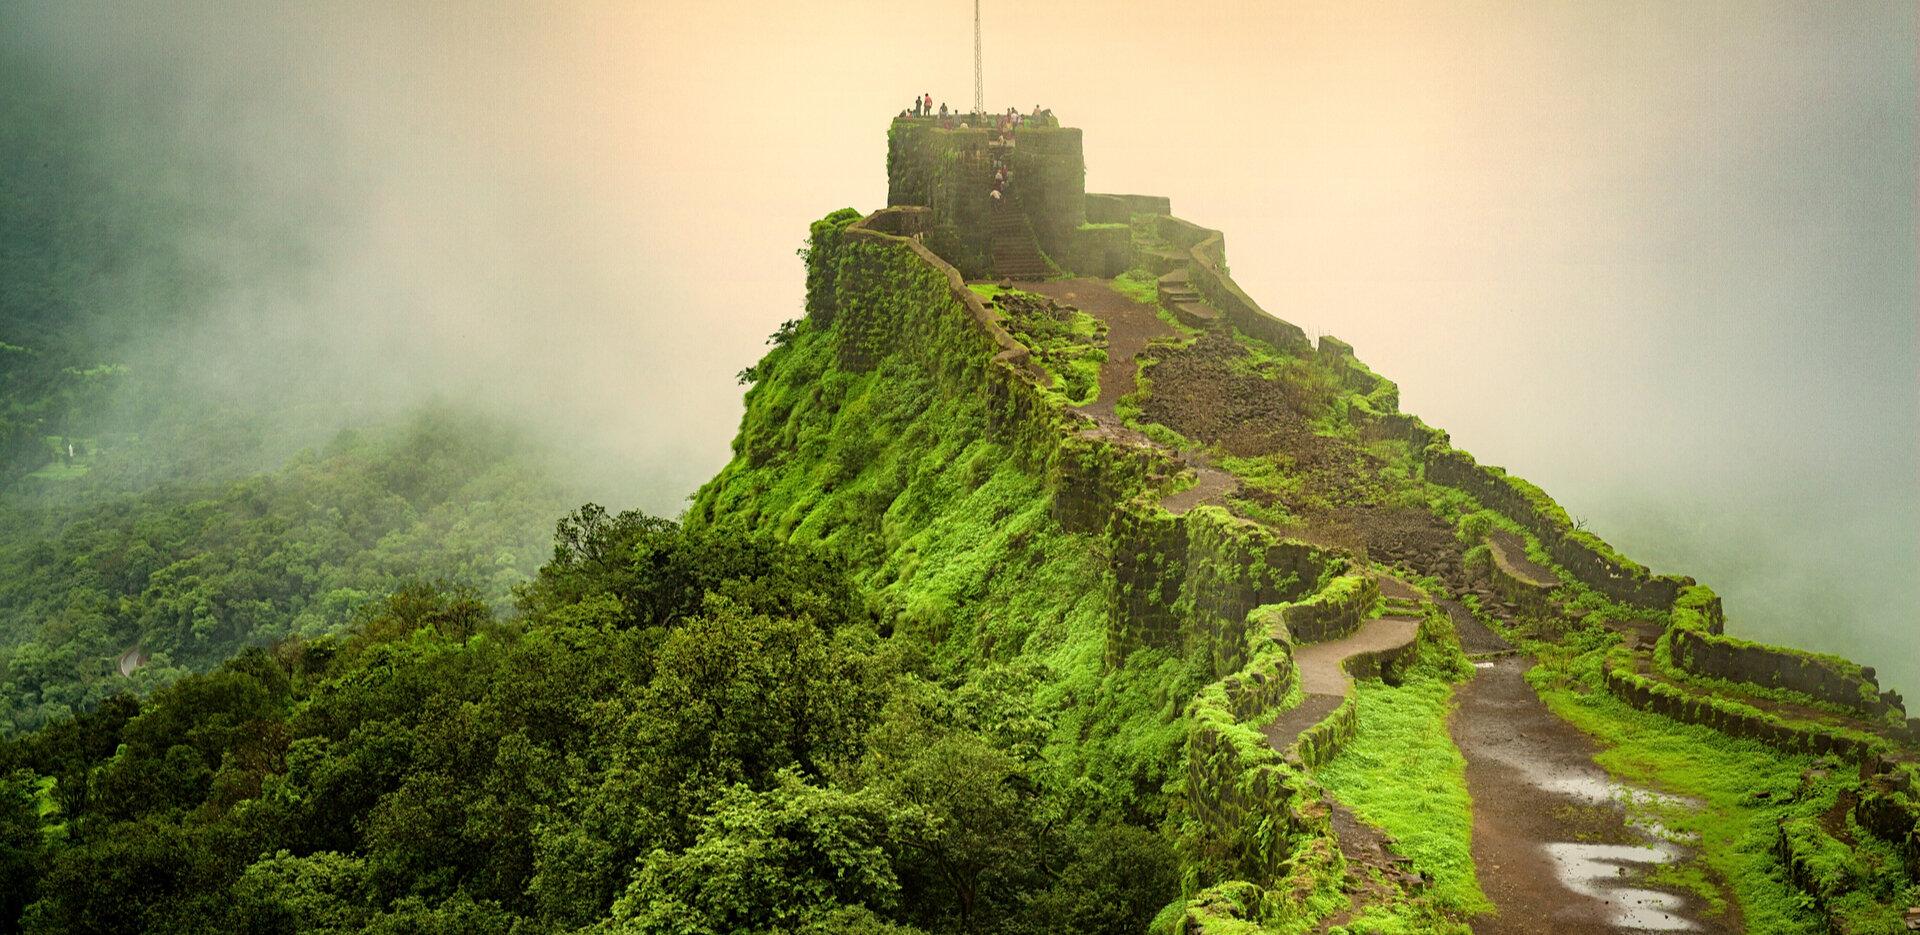 trekking destinations in Maharashtra